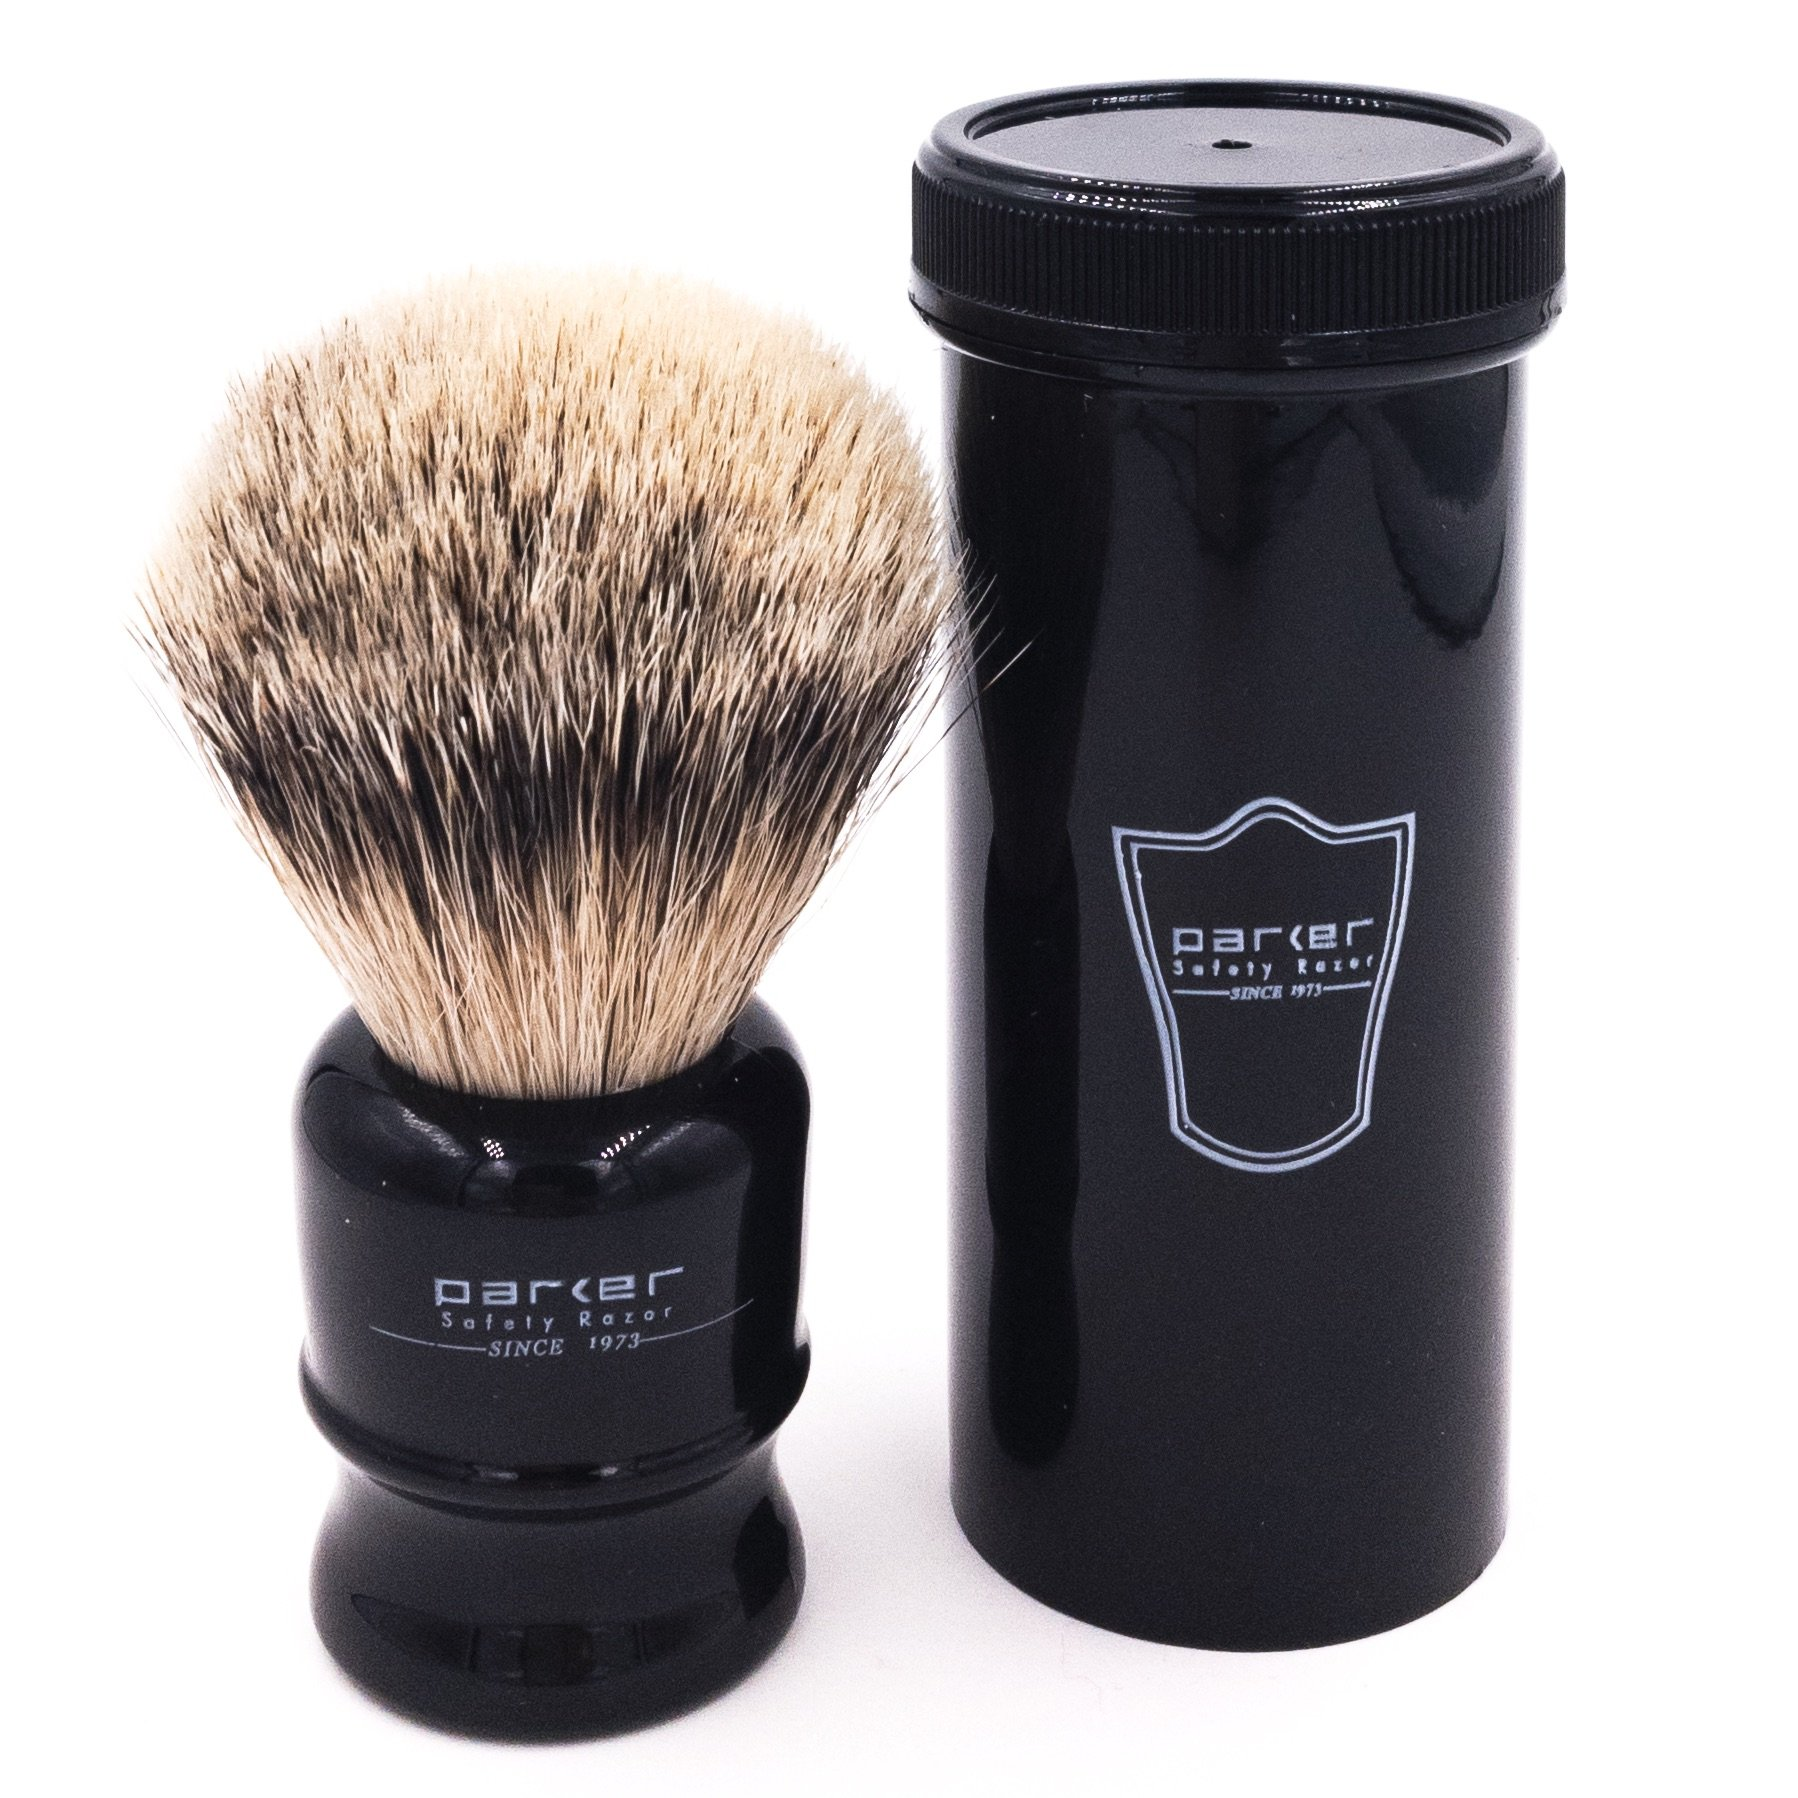 Parker Safety Razor, 100% Silvertip Travel Shave Brush with Travel Case